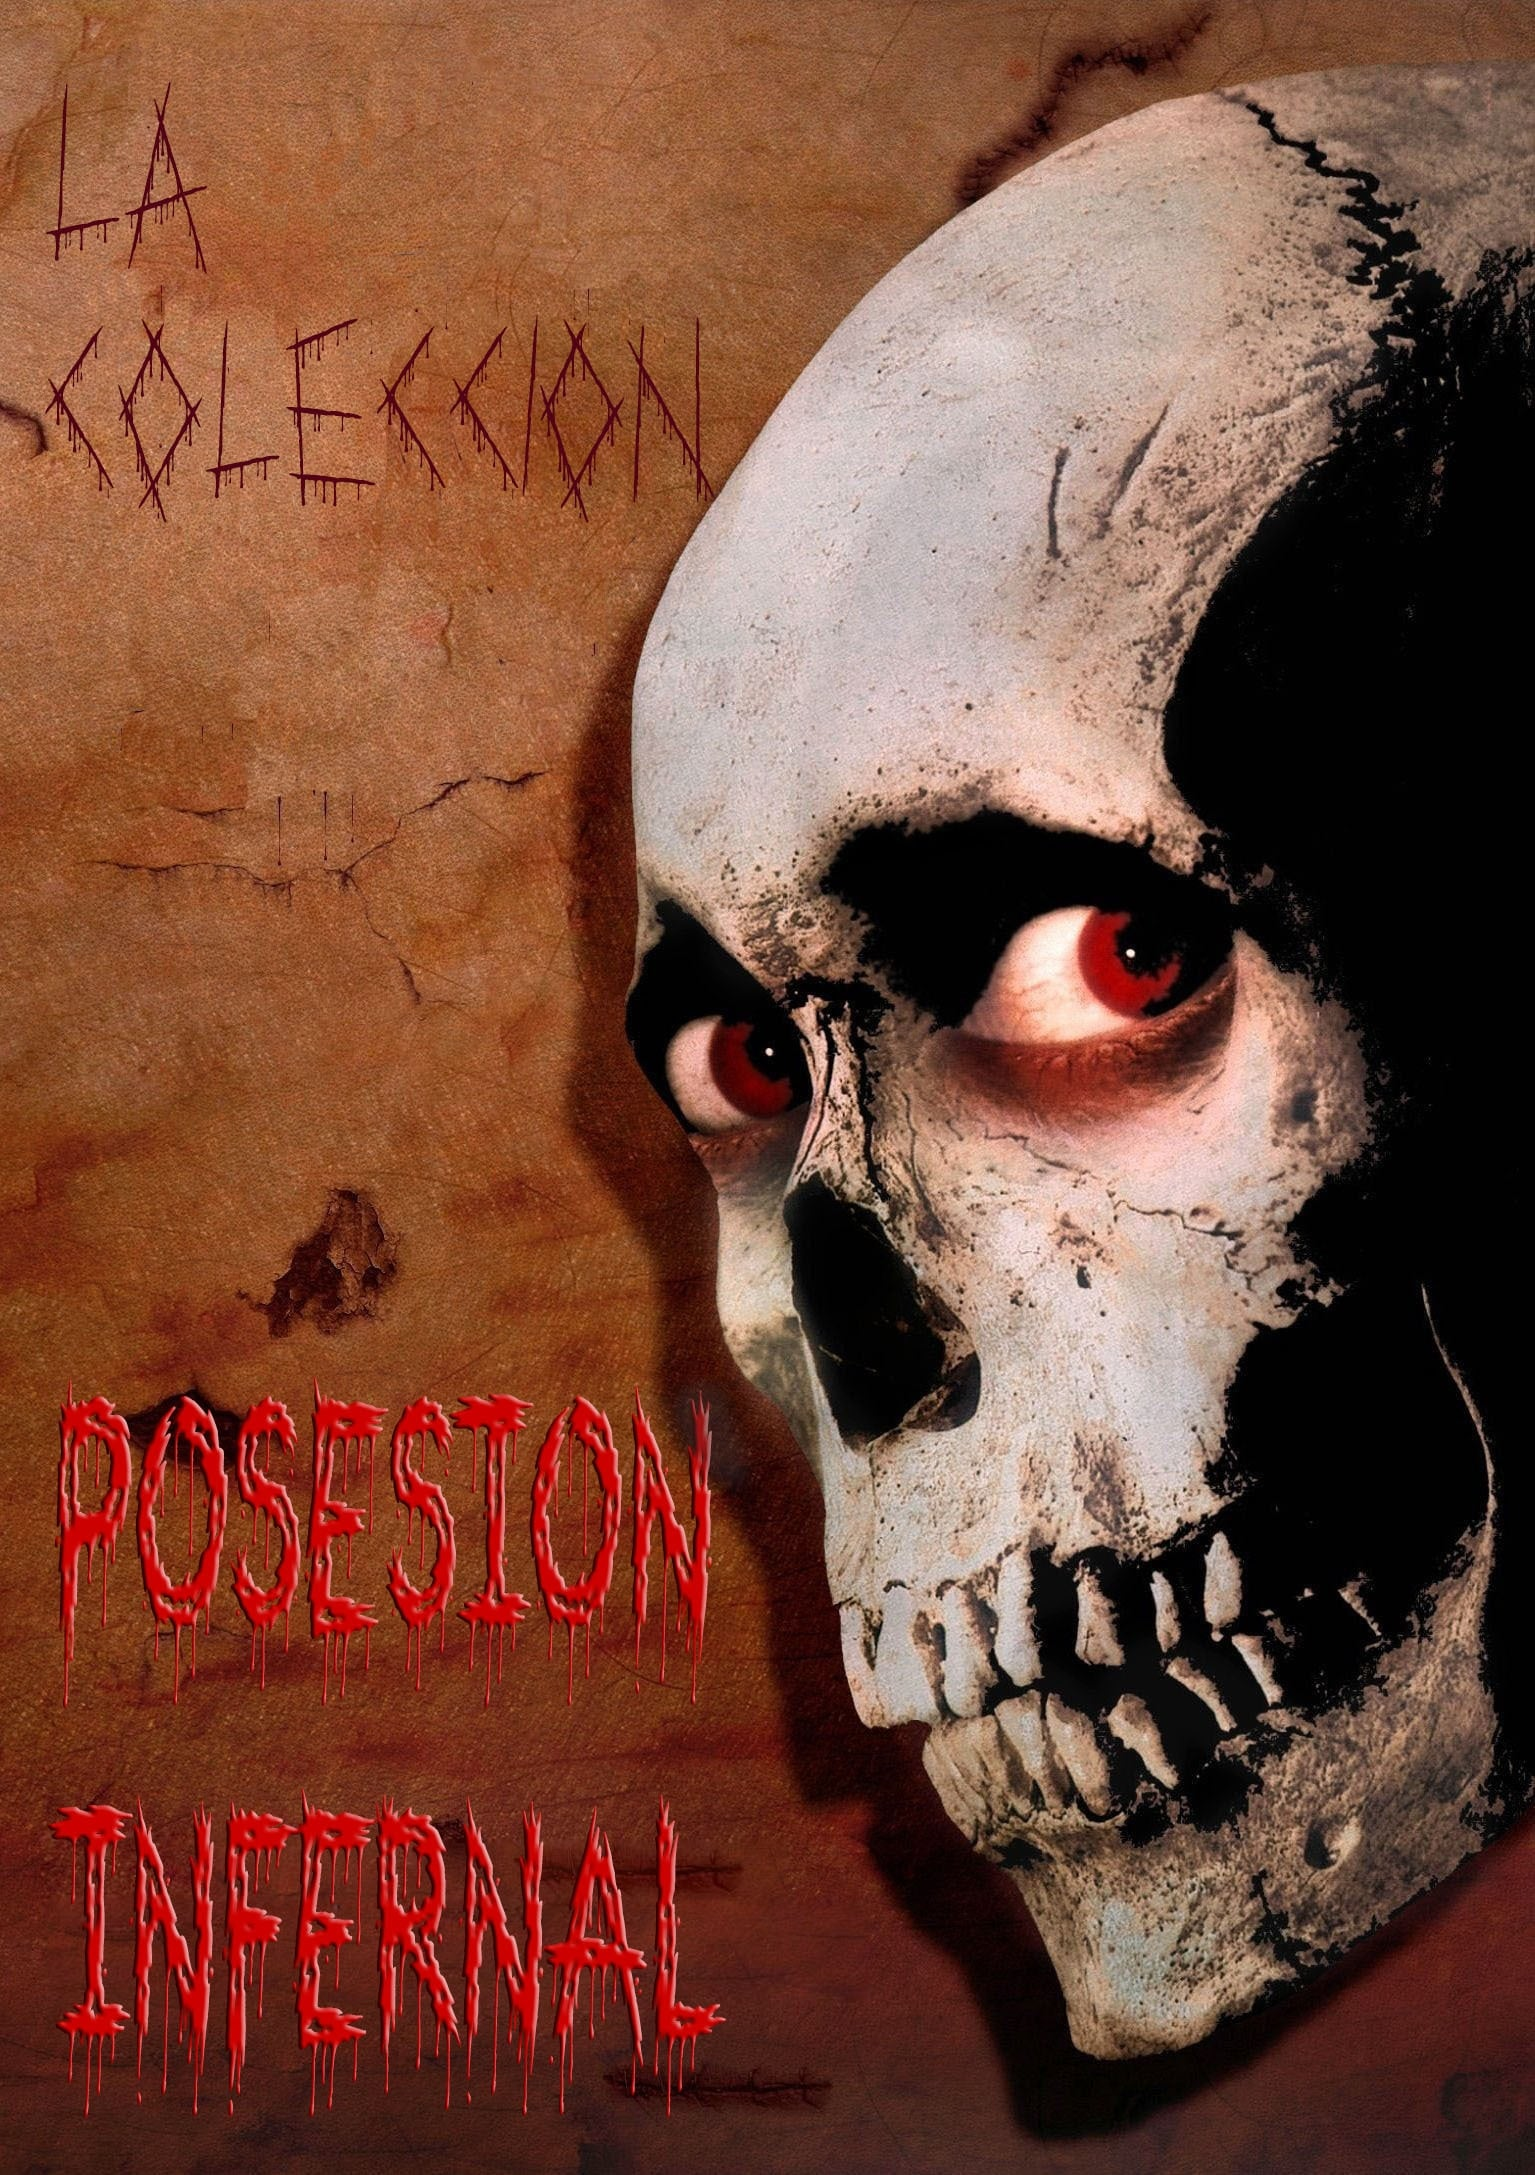 Póster Posesi�n infernal - La Colecci�n